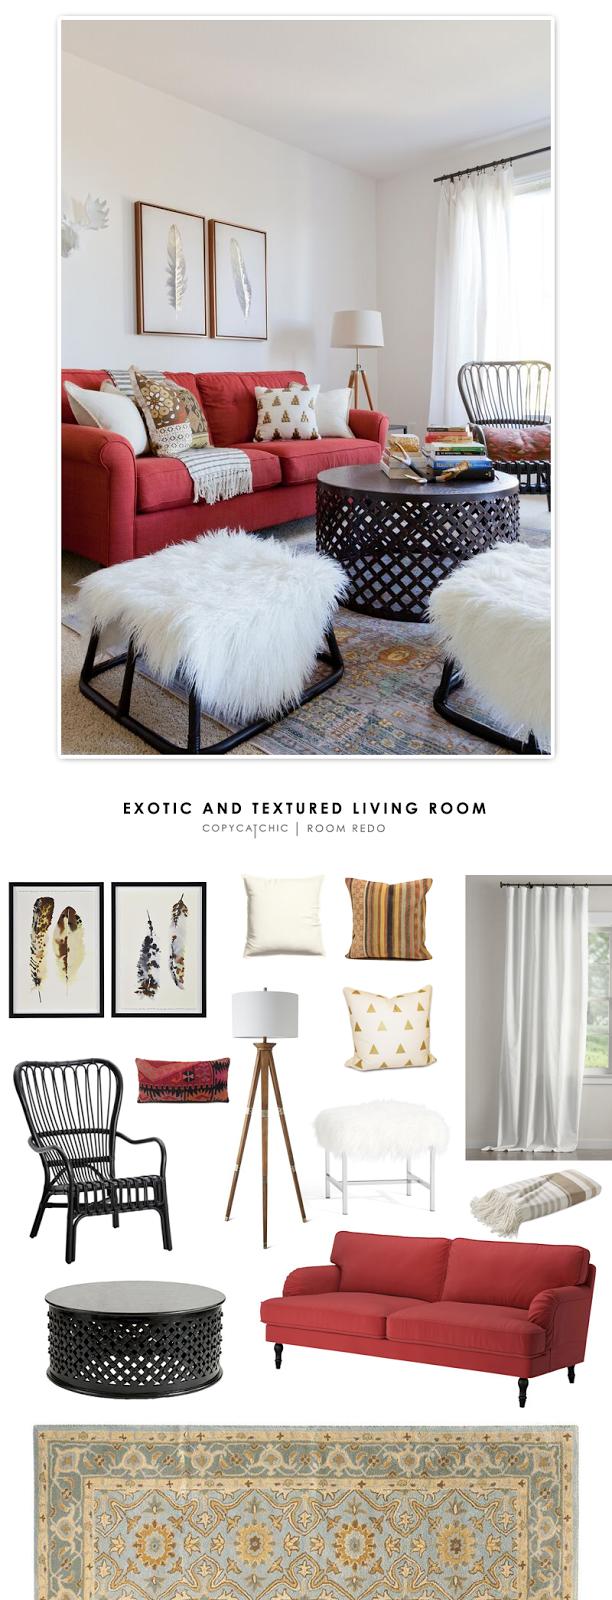 Copy Cat Chic Room Redo | Exotic & Textured Living Room - copycatchic